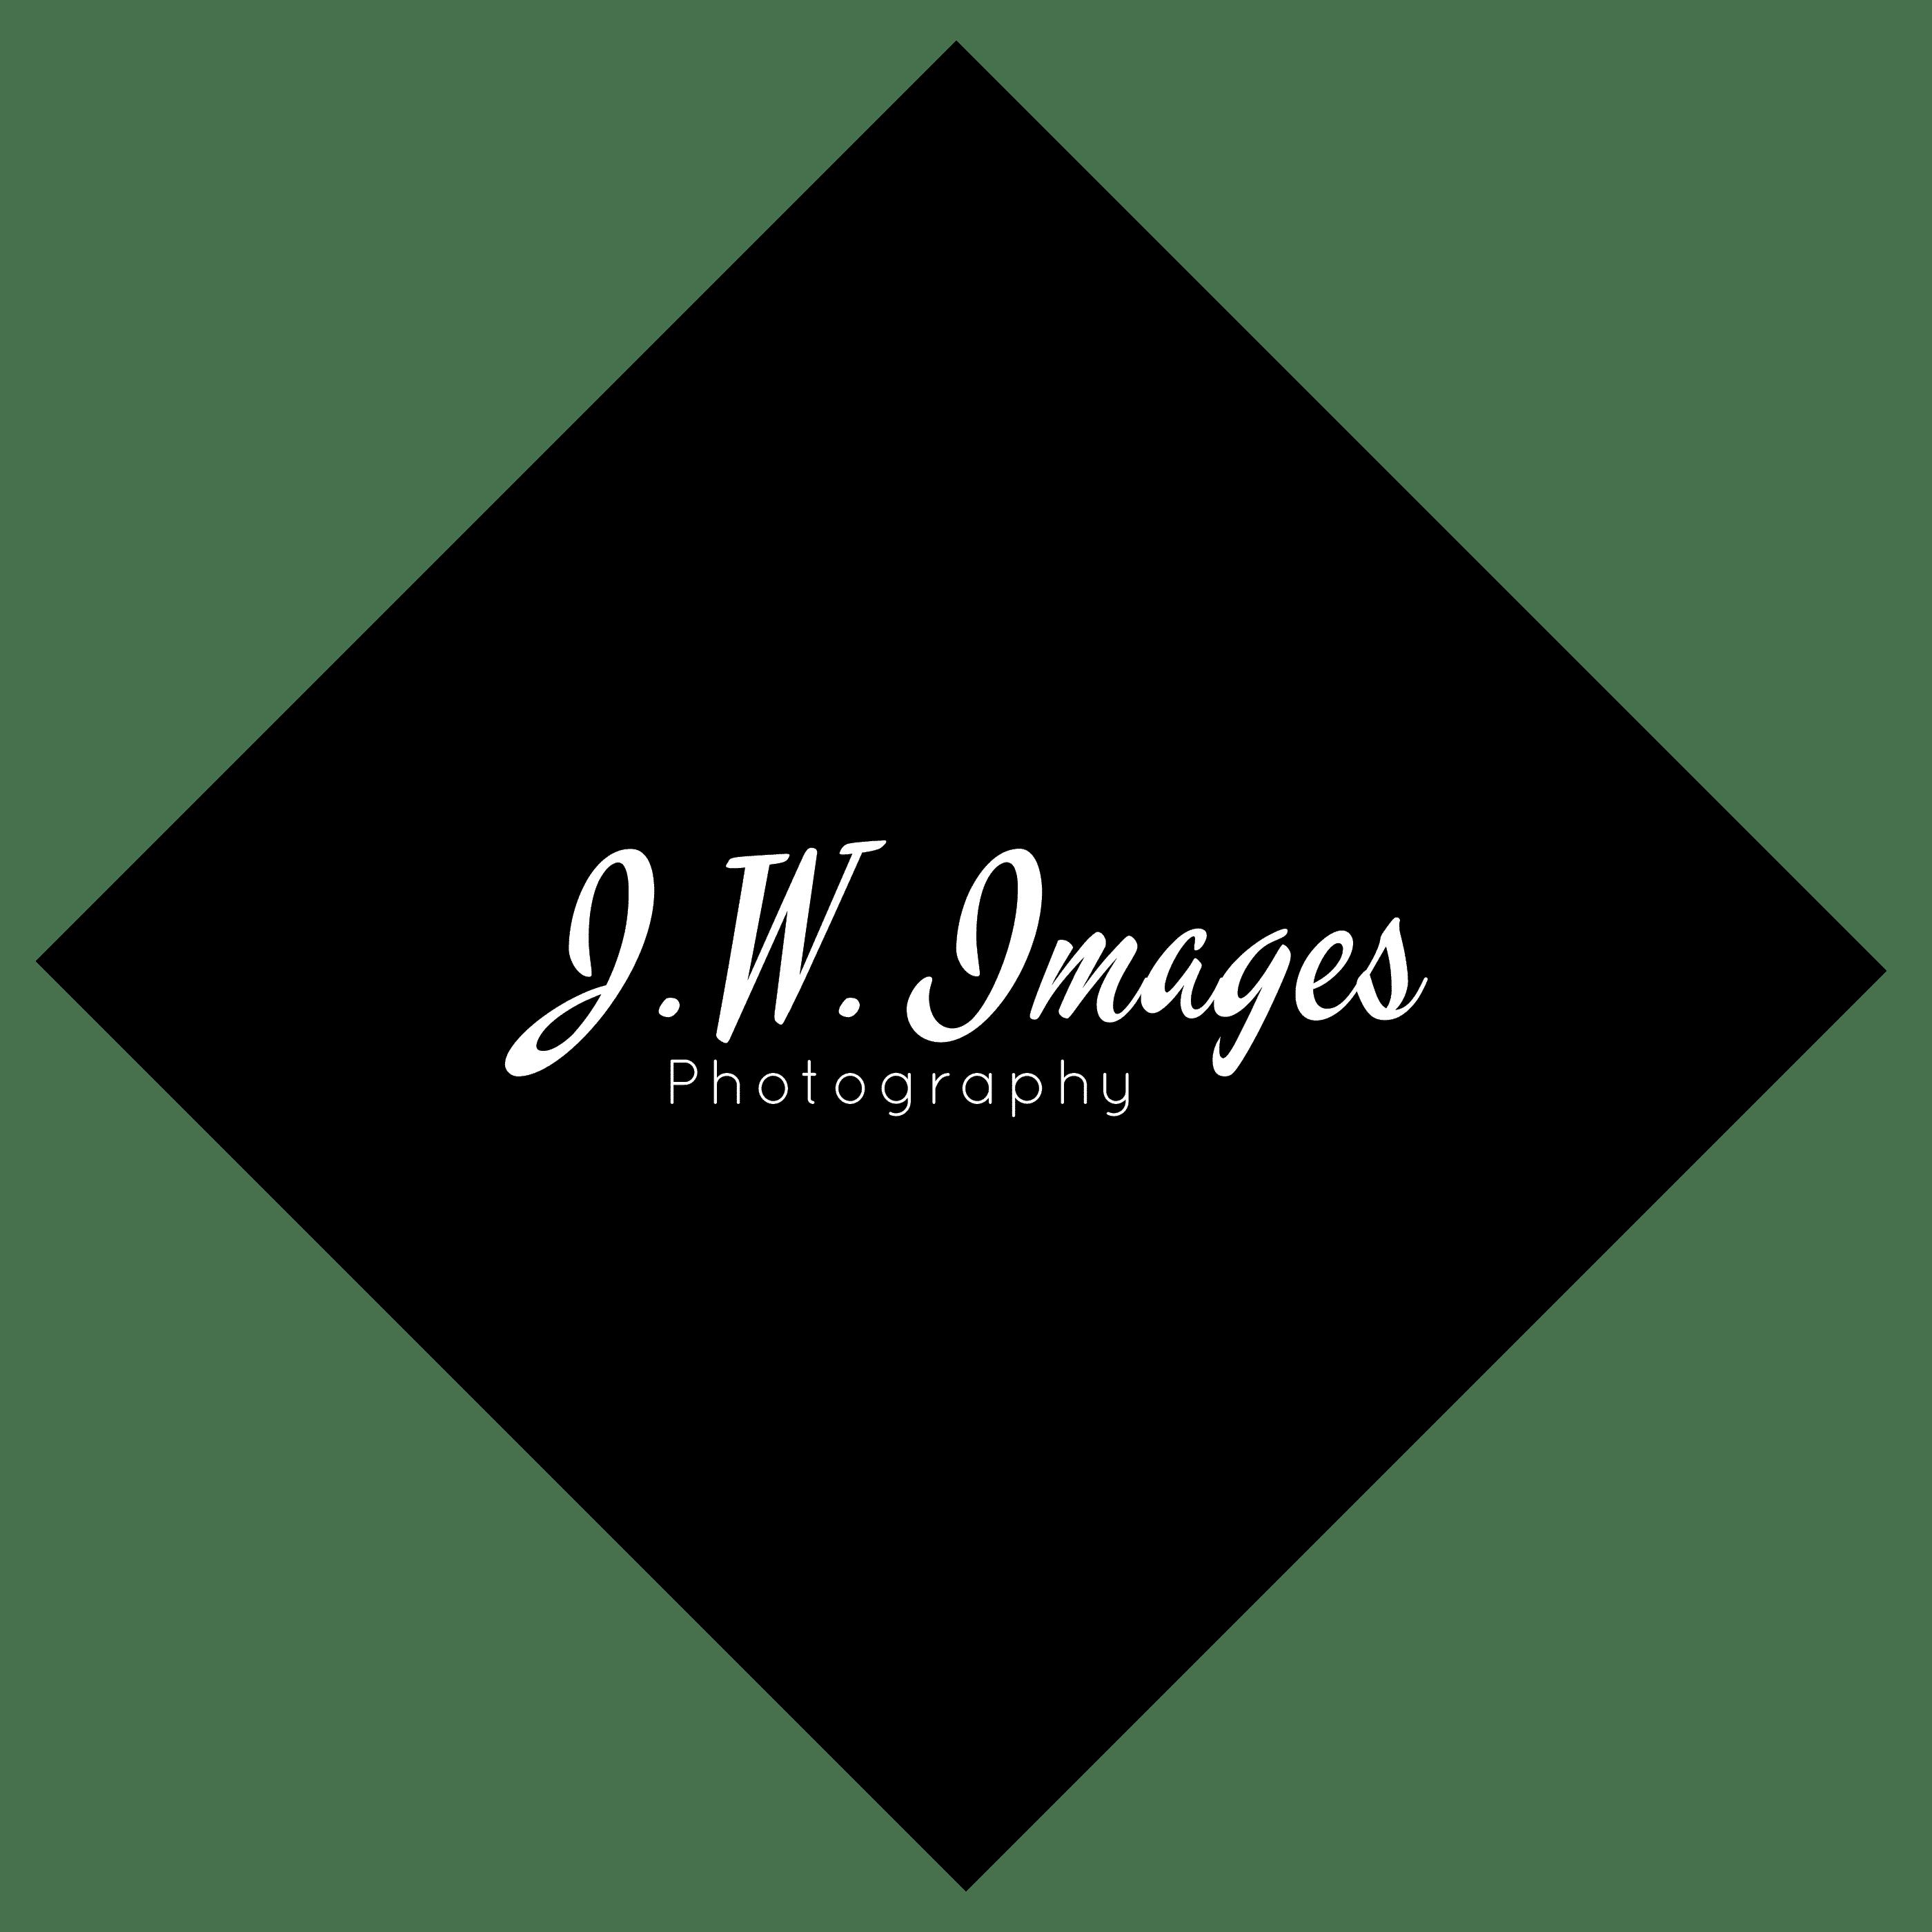 Jw Images